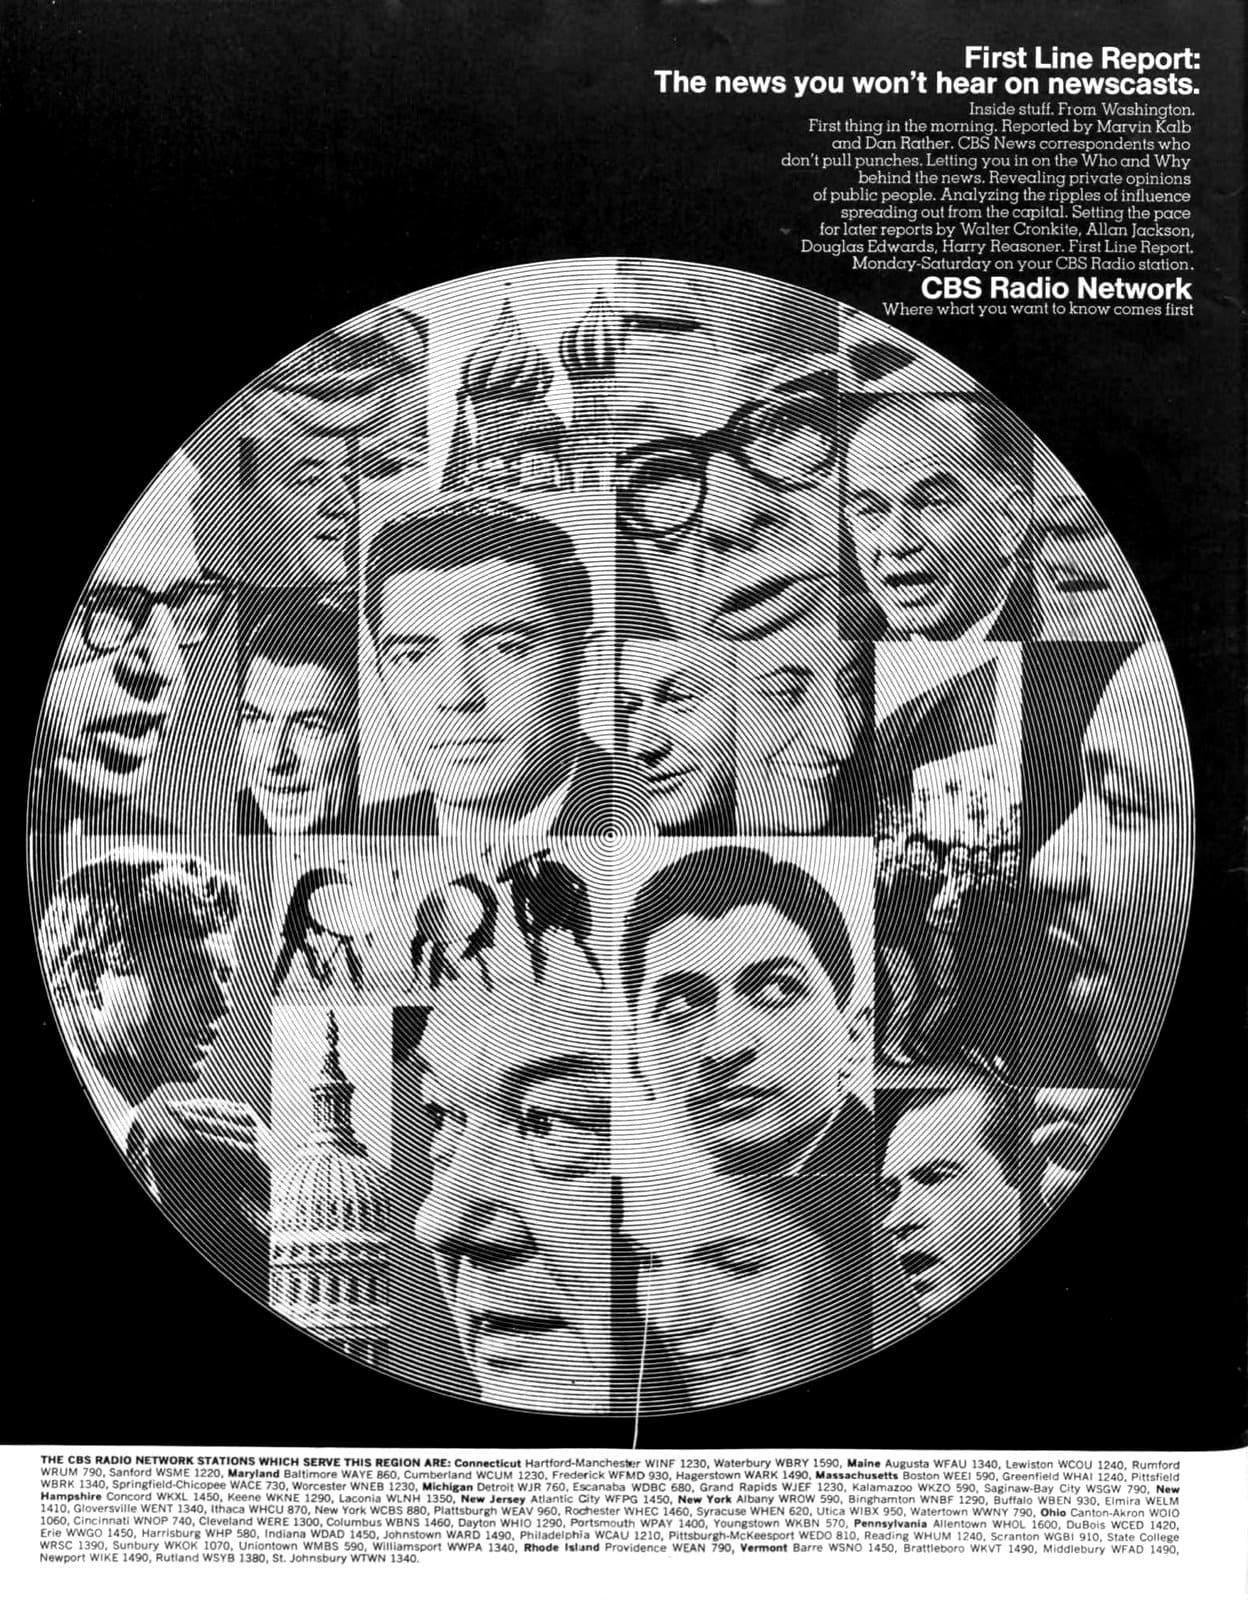 CBS radio news - First line report (1968)